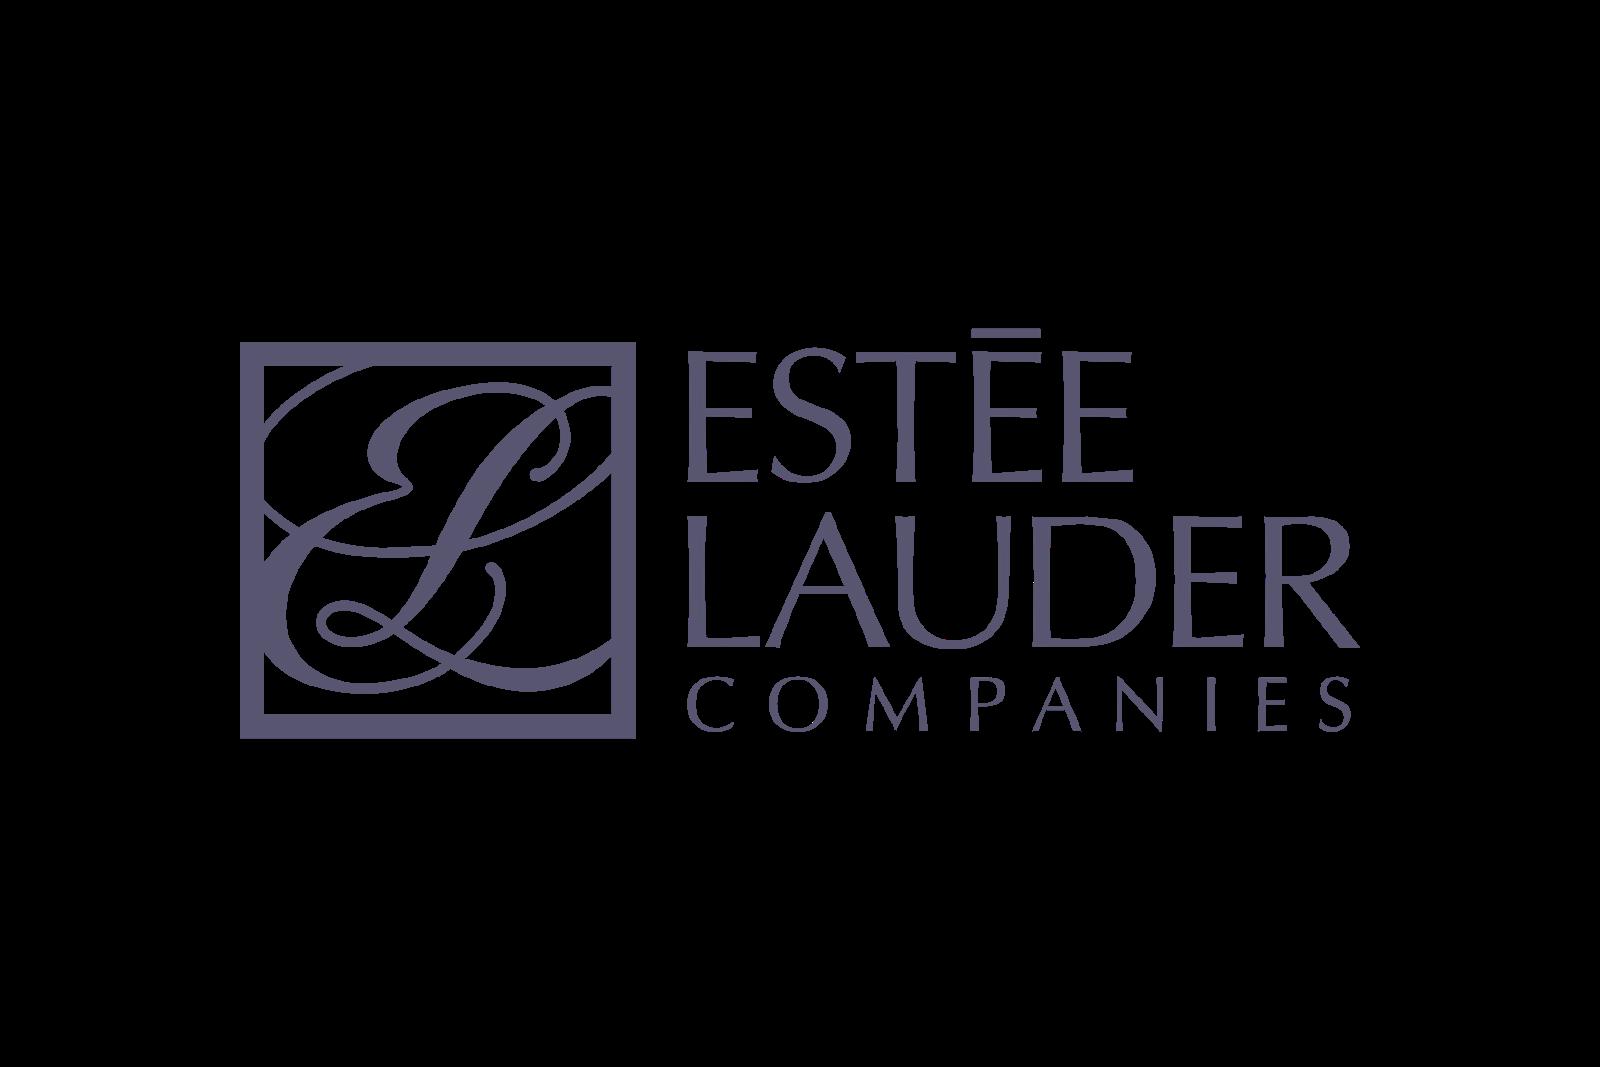 Estee-Lauder-logo-1.png